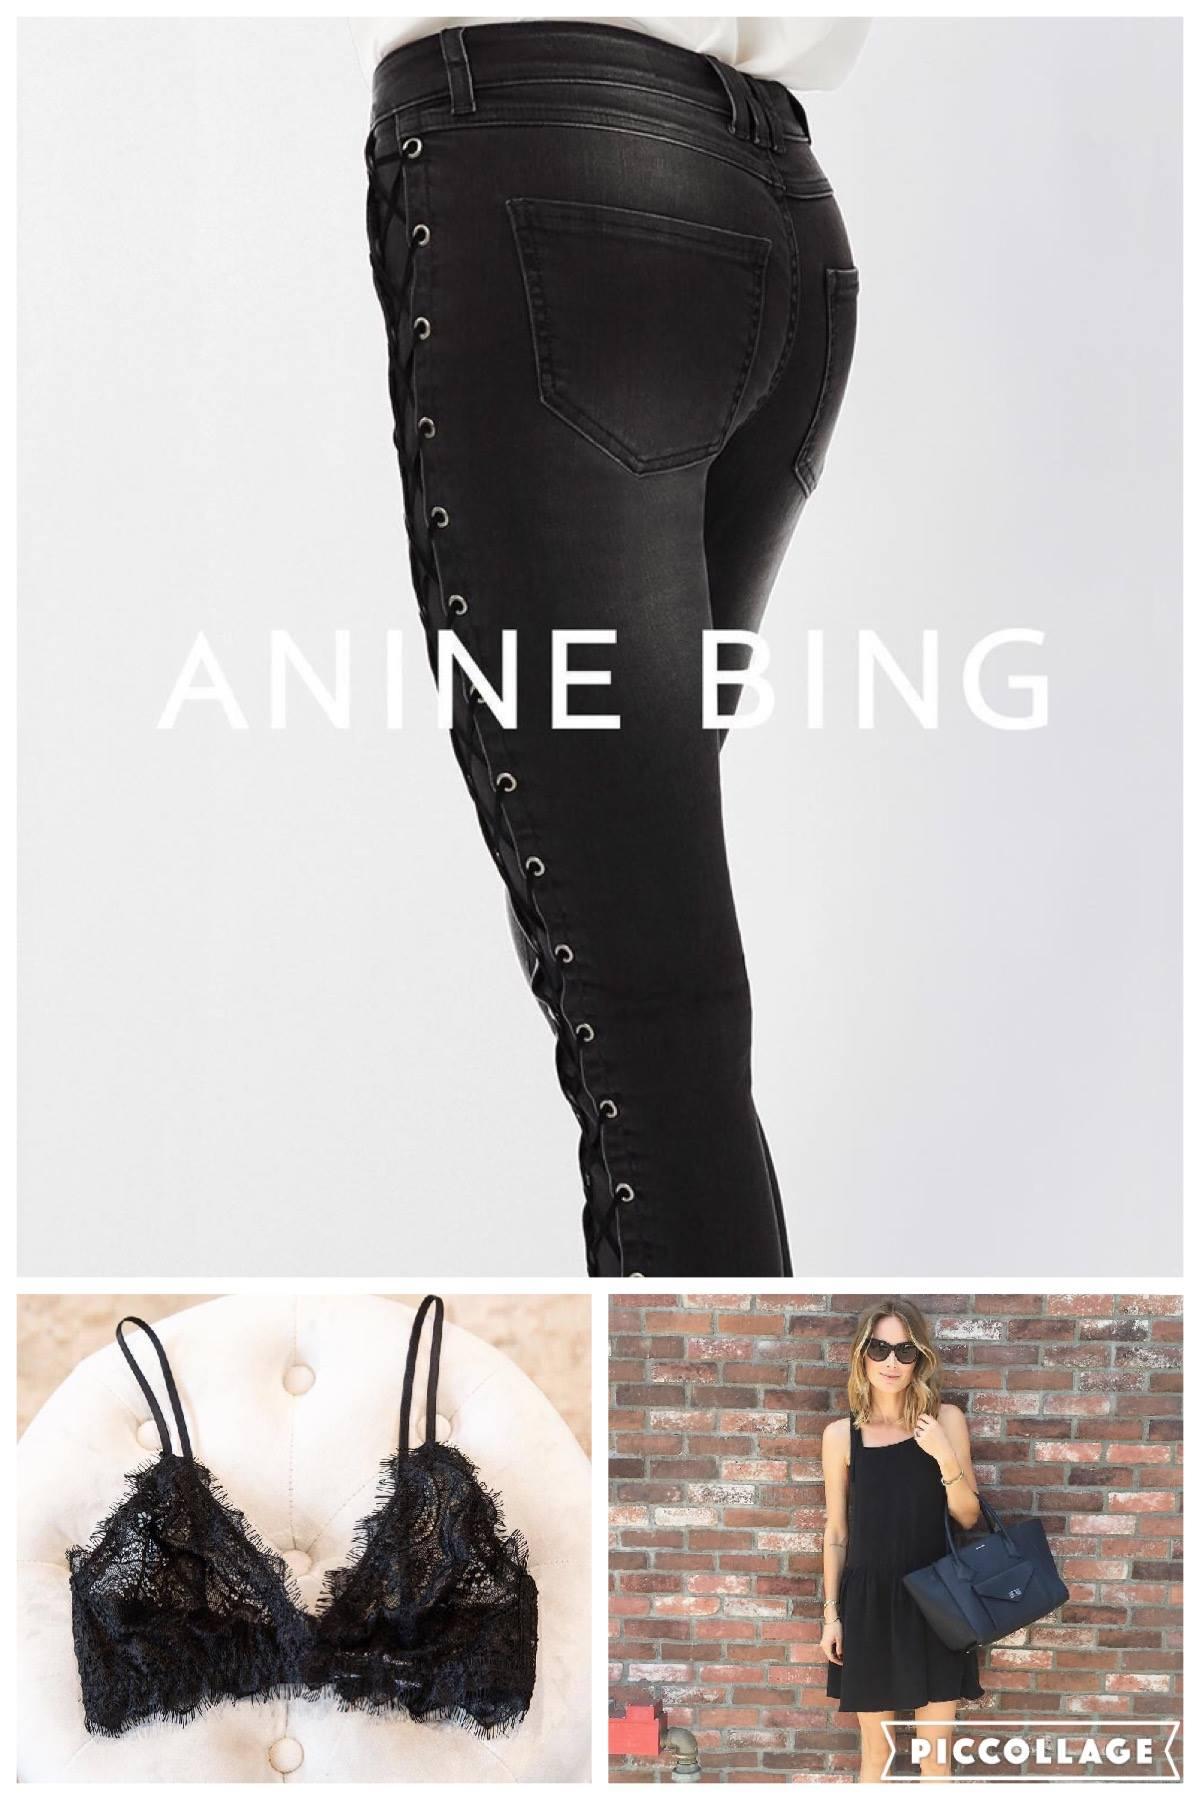 Anine Bing Herbst - Sinnesberger Englhaus Fashionstore Kitzbühel